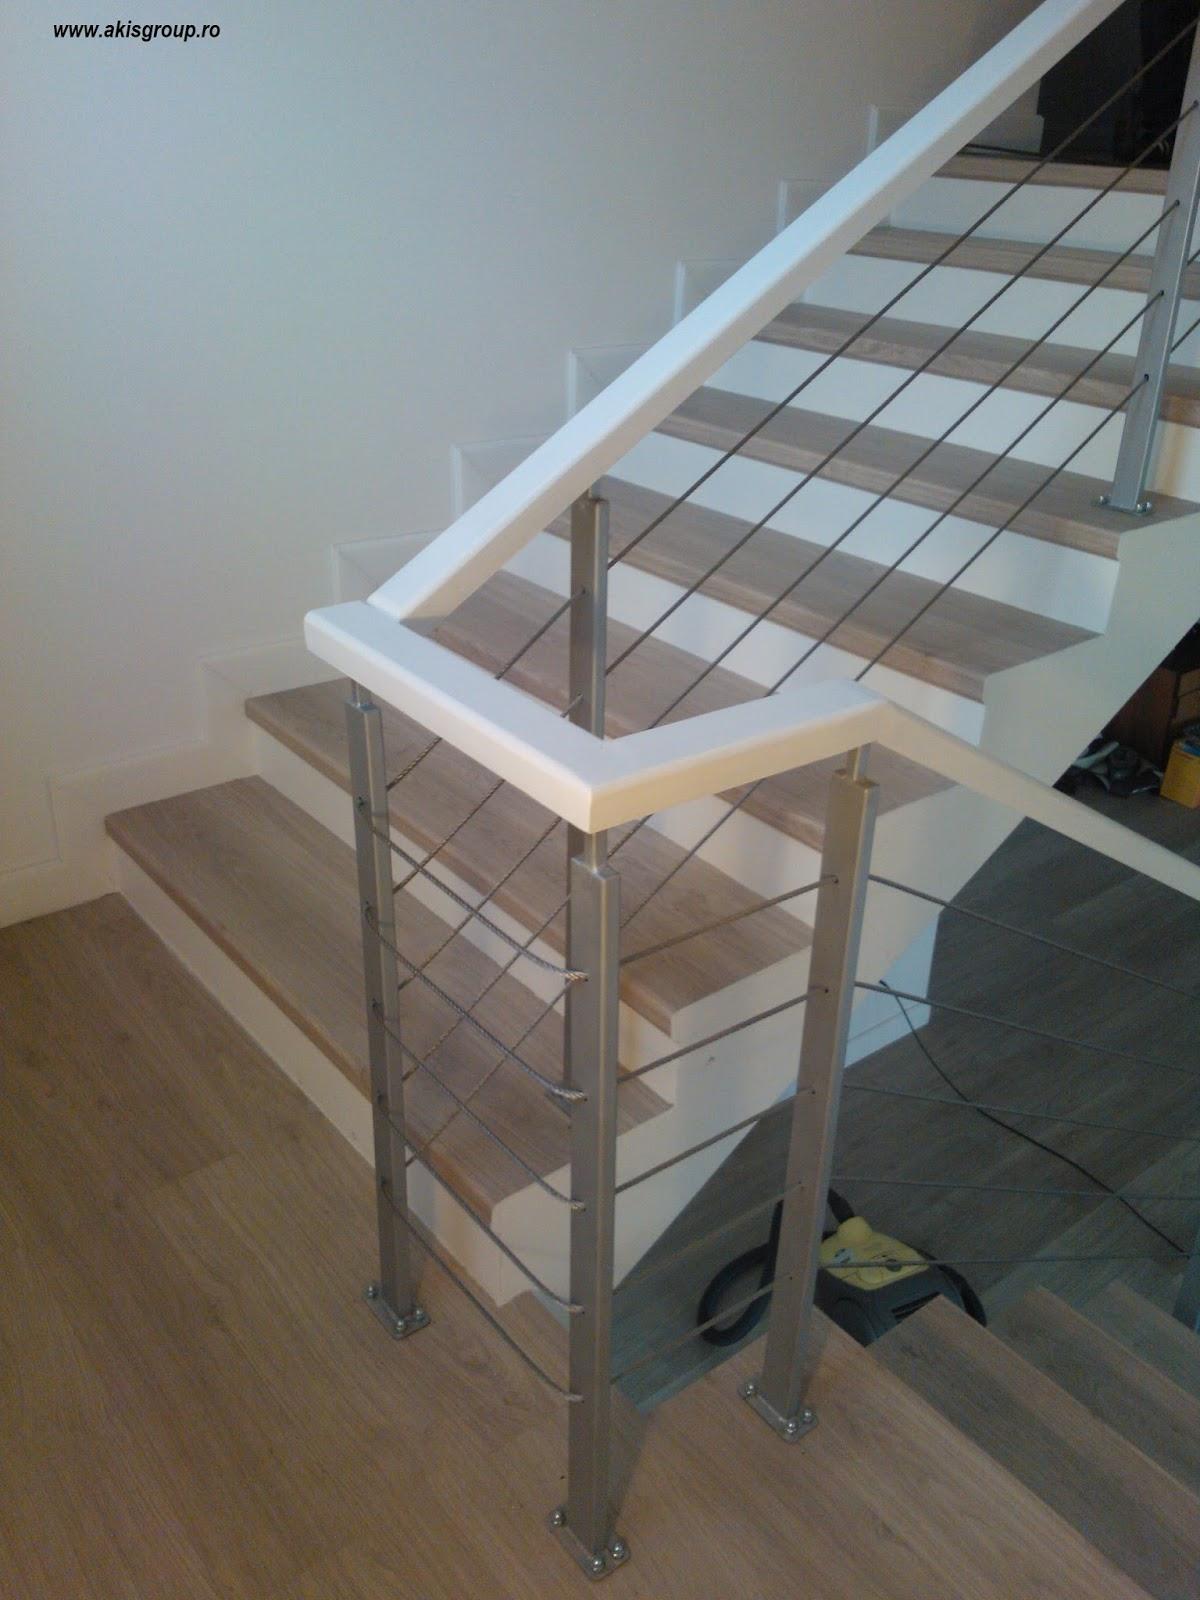 gel nder aus schmiedeeisen kabel gel nder. Black Bedroom Furniture Sets. Home Design Ideas